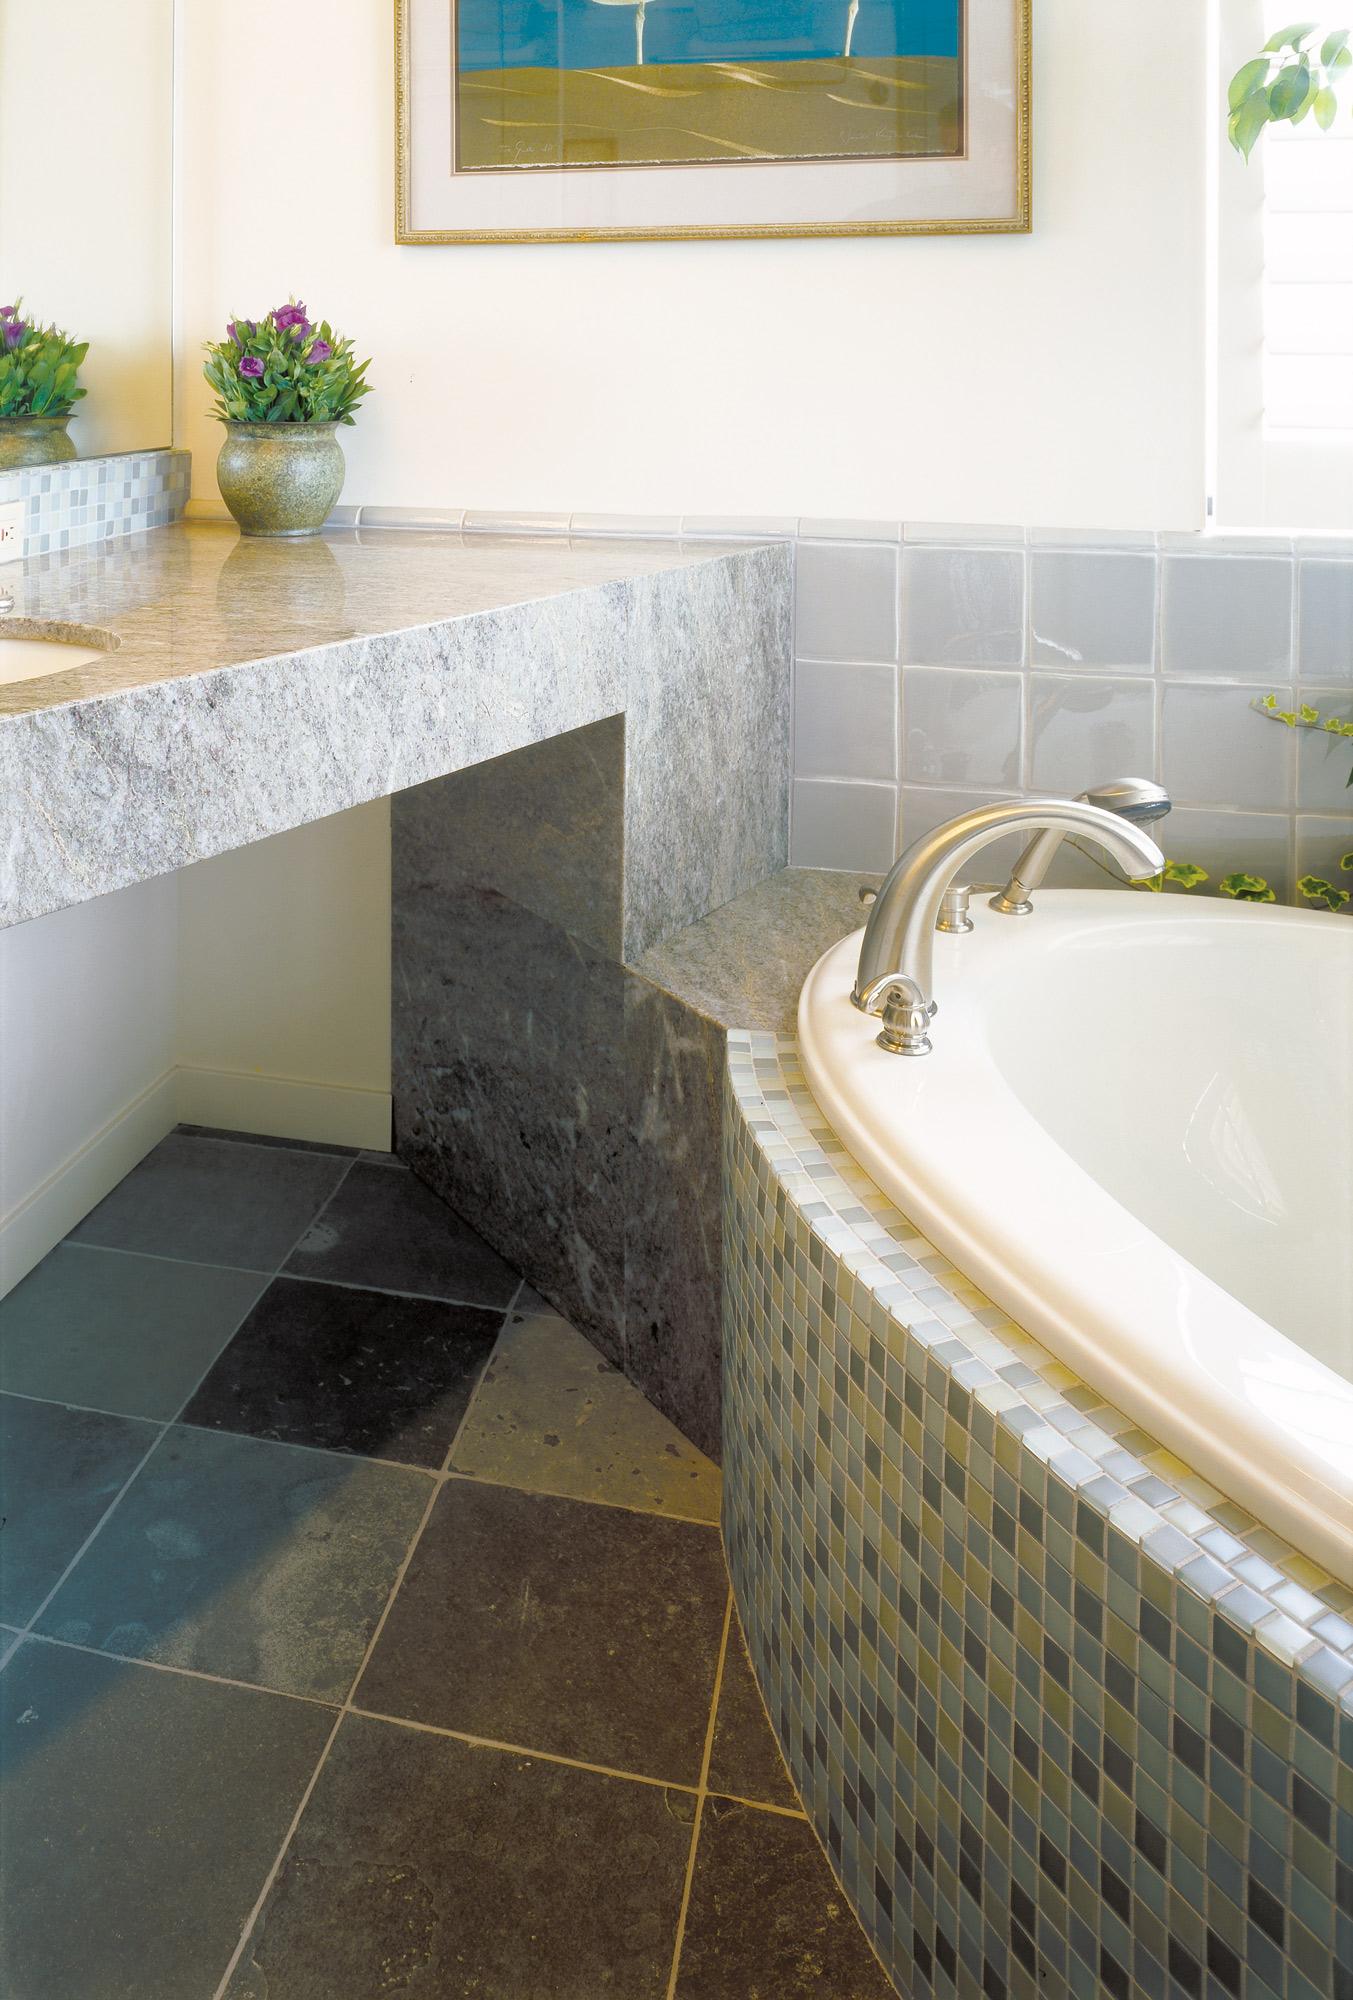 Kaplan-Architects-San Francisco-master-bath-remodel-vanity and tub.jpg